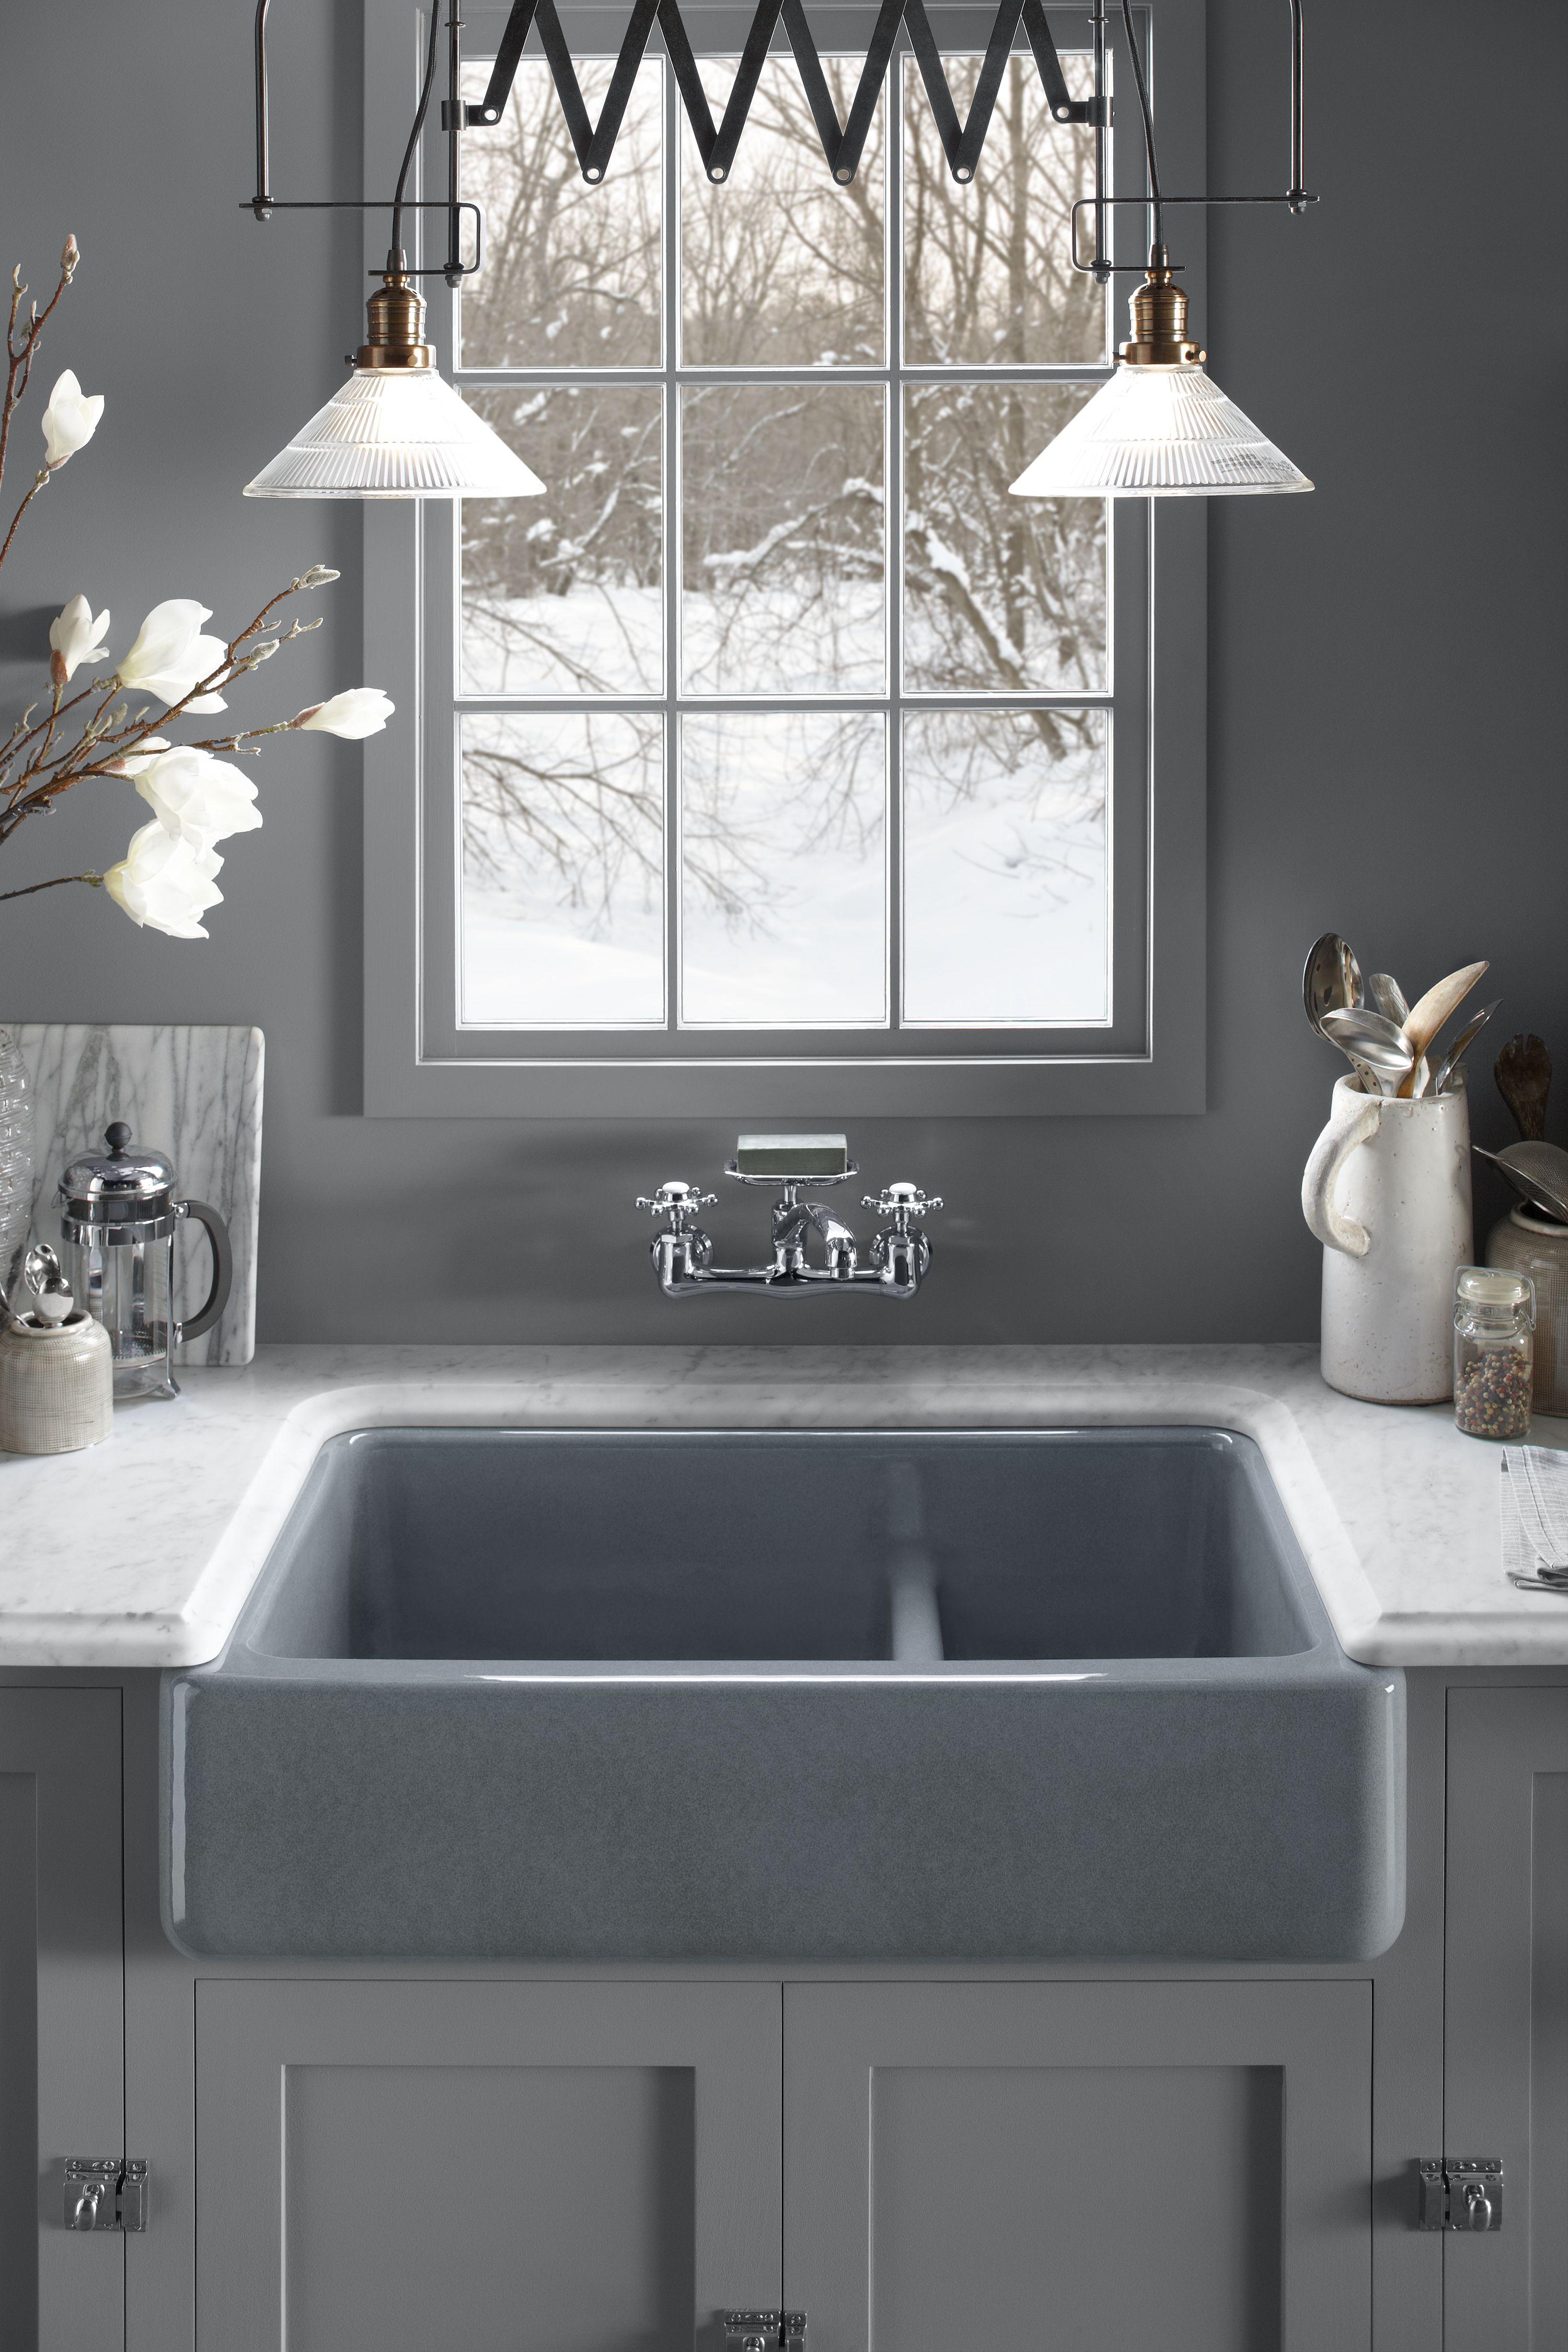 Kohler Smart Divide Bowls Make Our Whitehaven Sinks More Functional Than  Ever. A Low Barrier